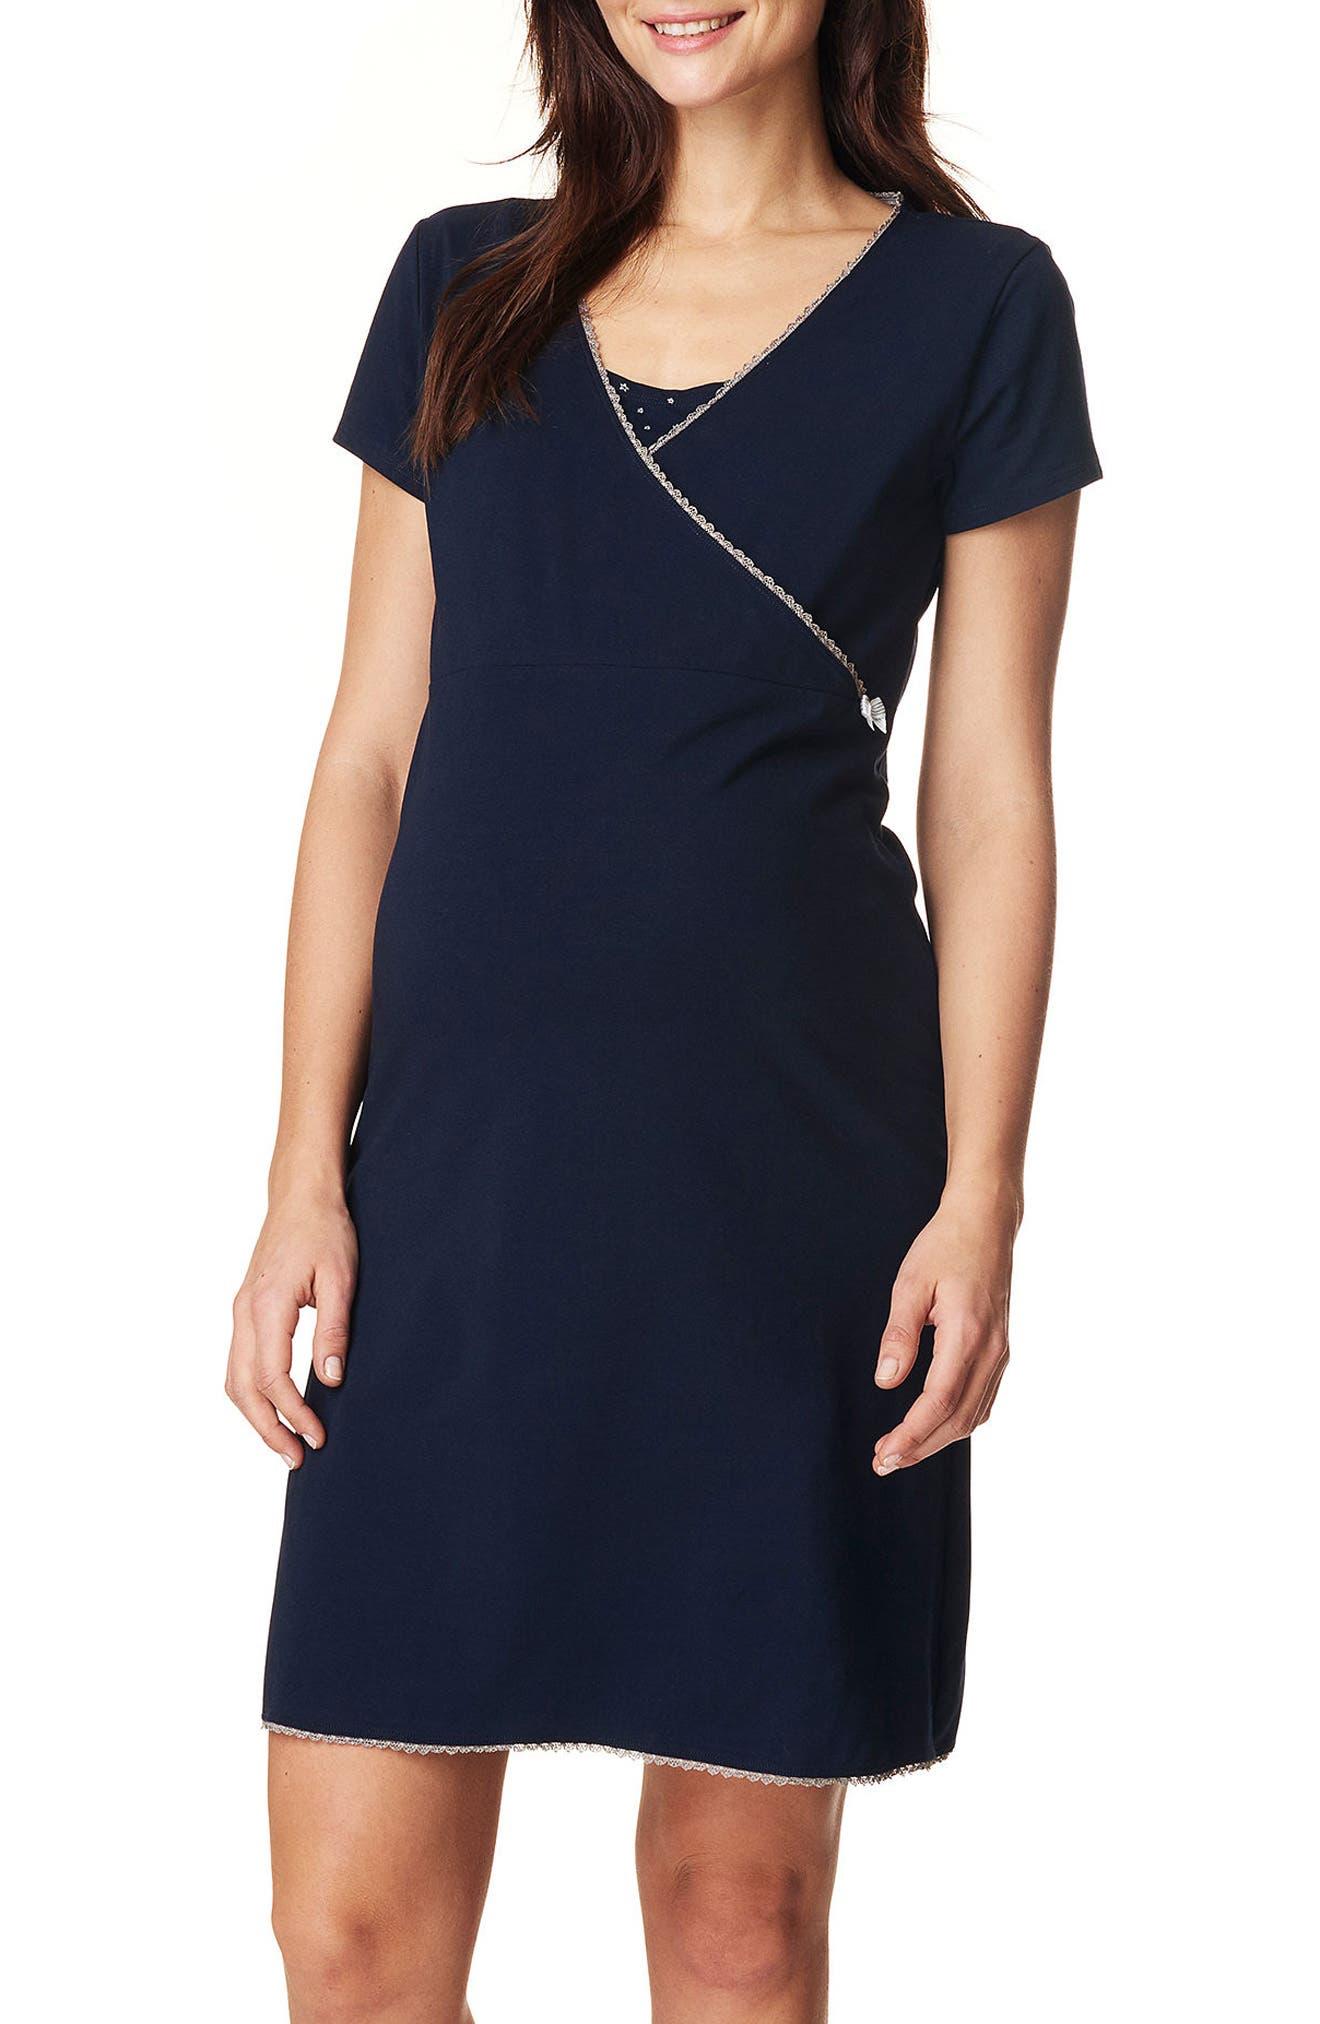 Main Image - Noppies Kimm Maternity/Nursing Jersey Dress